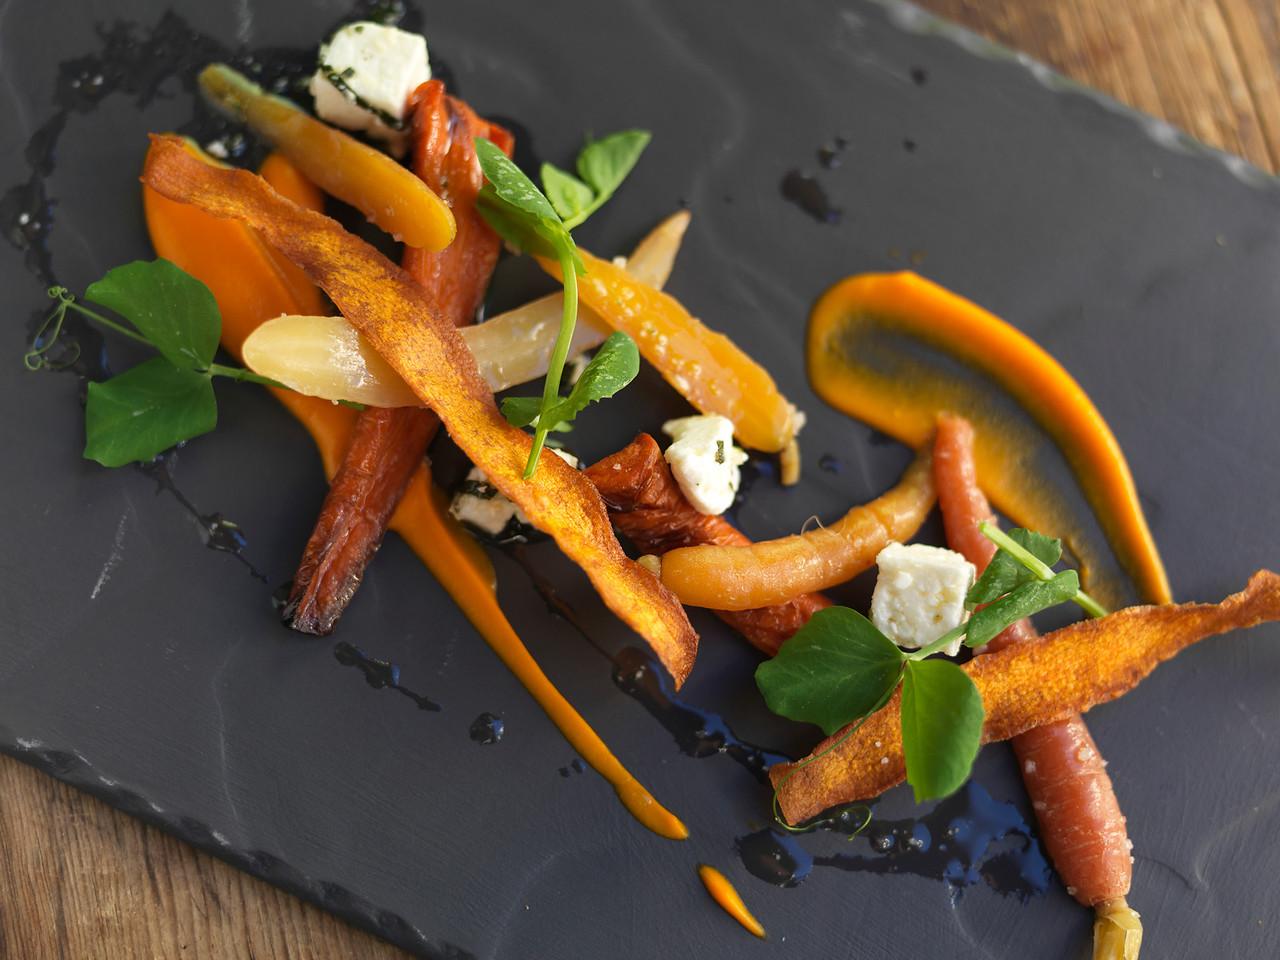 River Cafe Carrot and Mozarella Salad